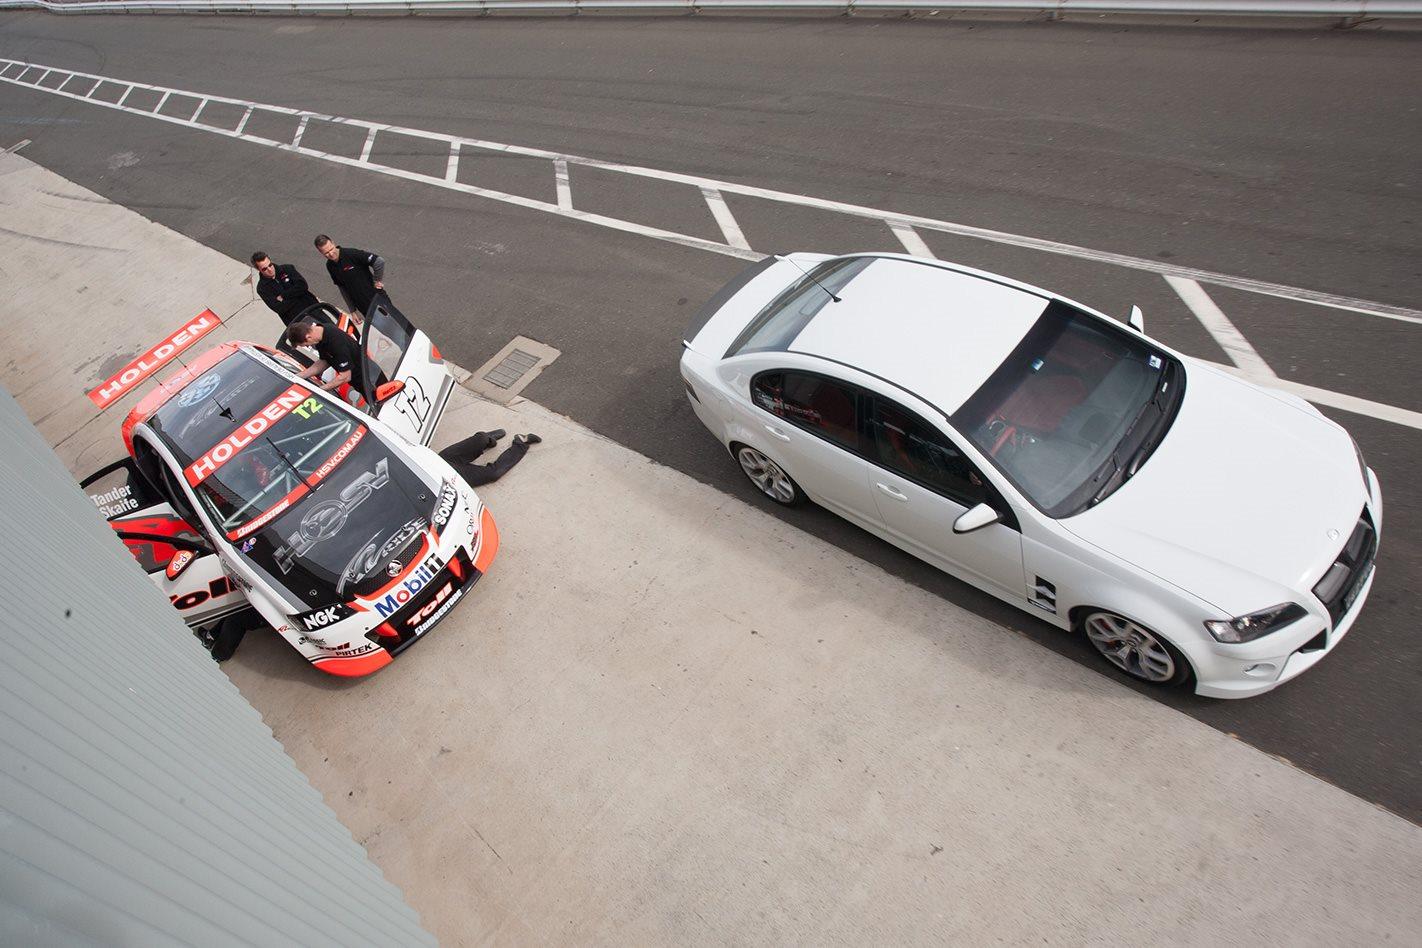 HSV-V8-Supercar-vs-HSV-W427-pitstop.jpg